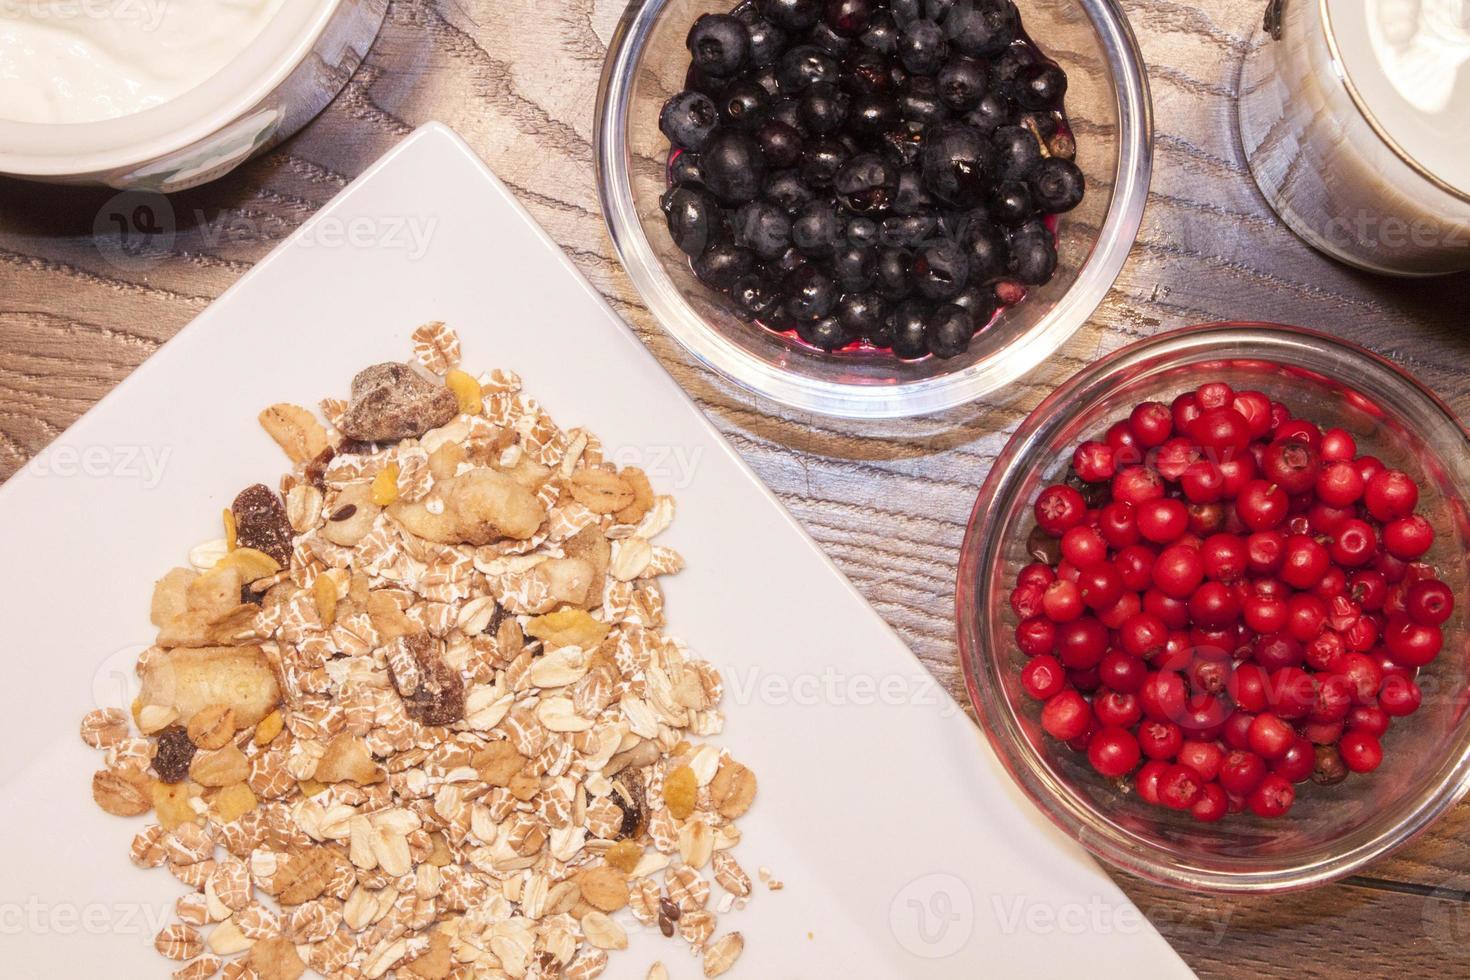 Blueberry, lingonberry and muesli photo